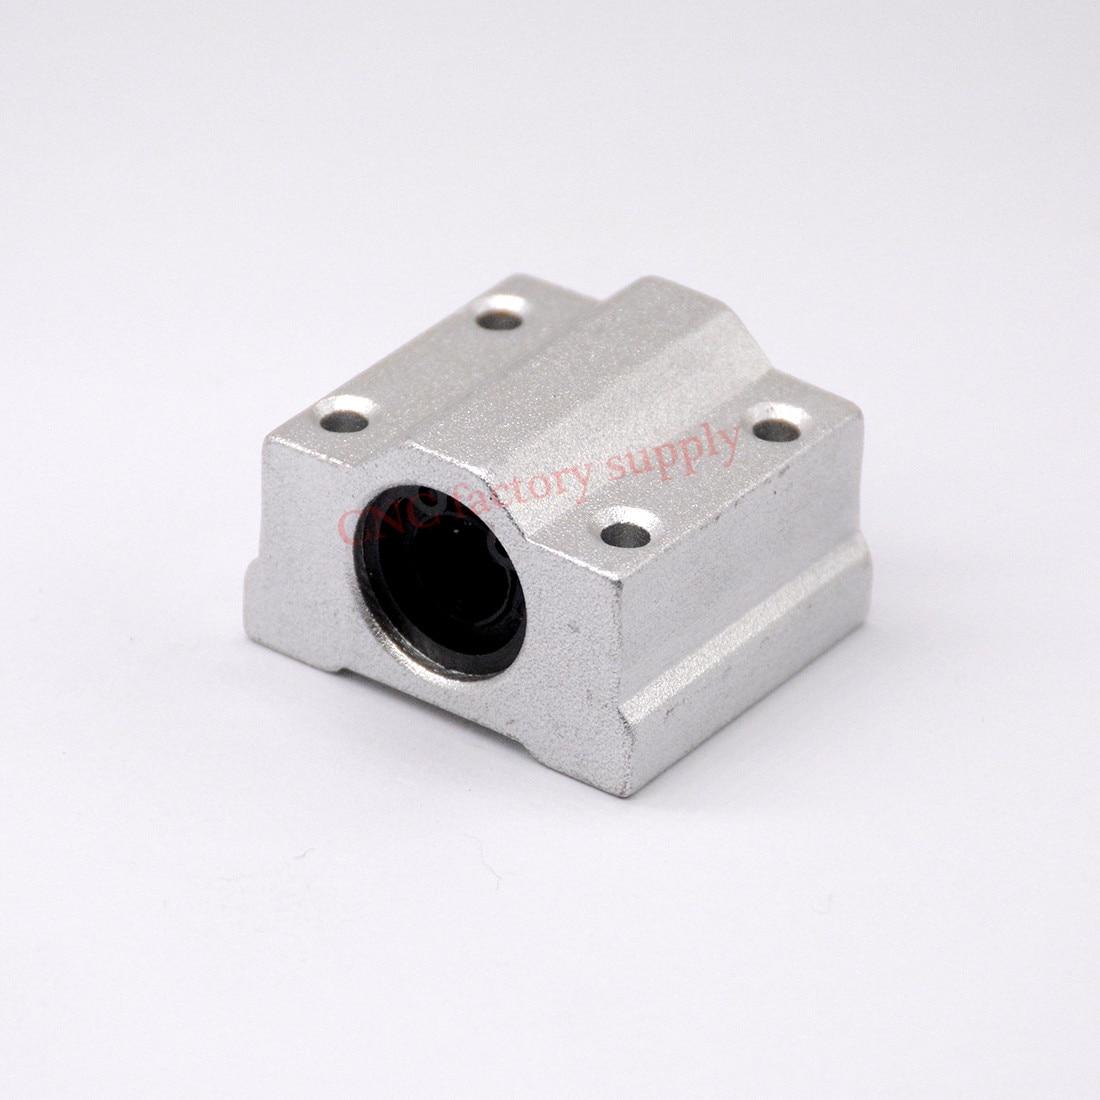 HOT sale 1pc SC10UU SCS10UU 10mm Linear Ball Bearing Block CNC Router hot sale 1pc lm20uu linear bushing 20mm cnc linear bearings